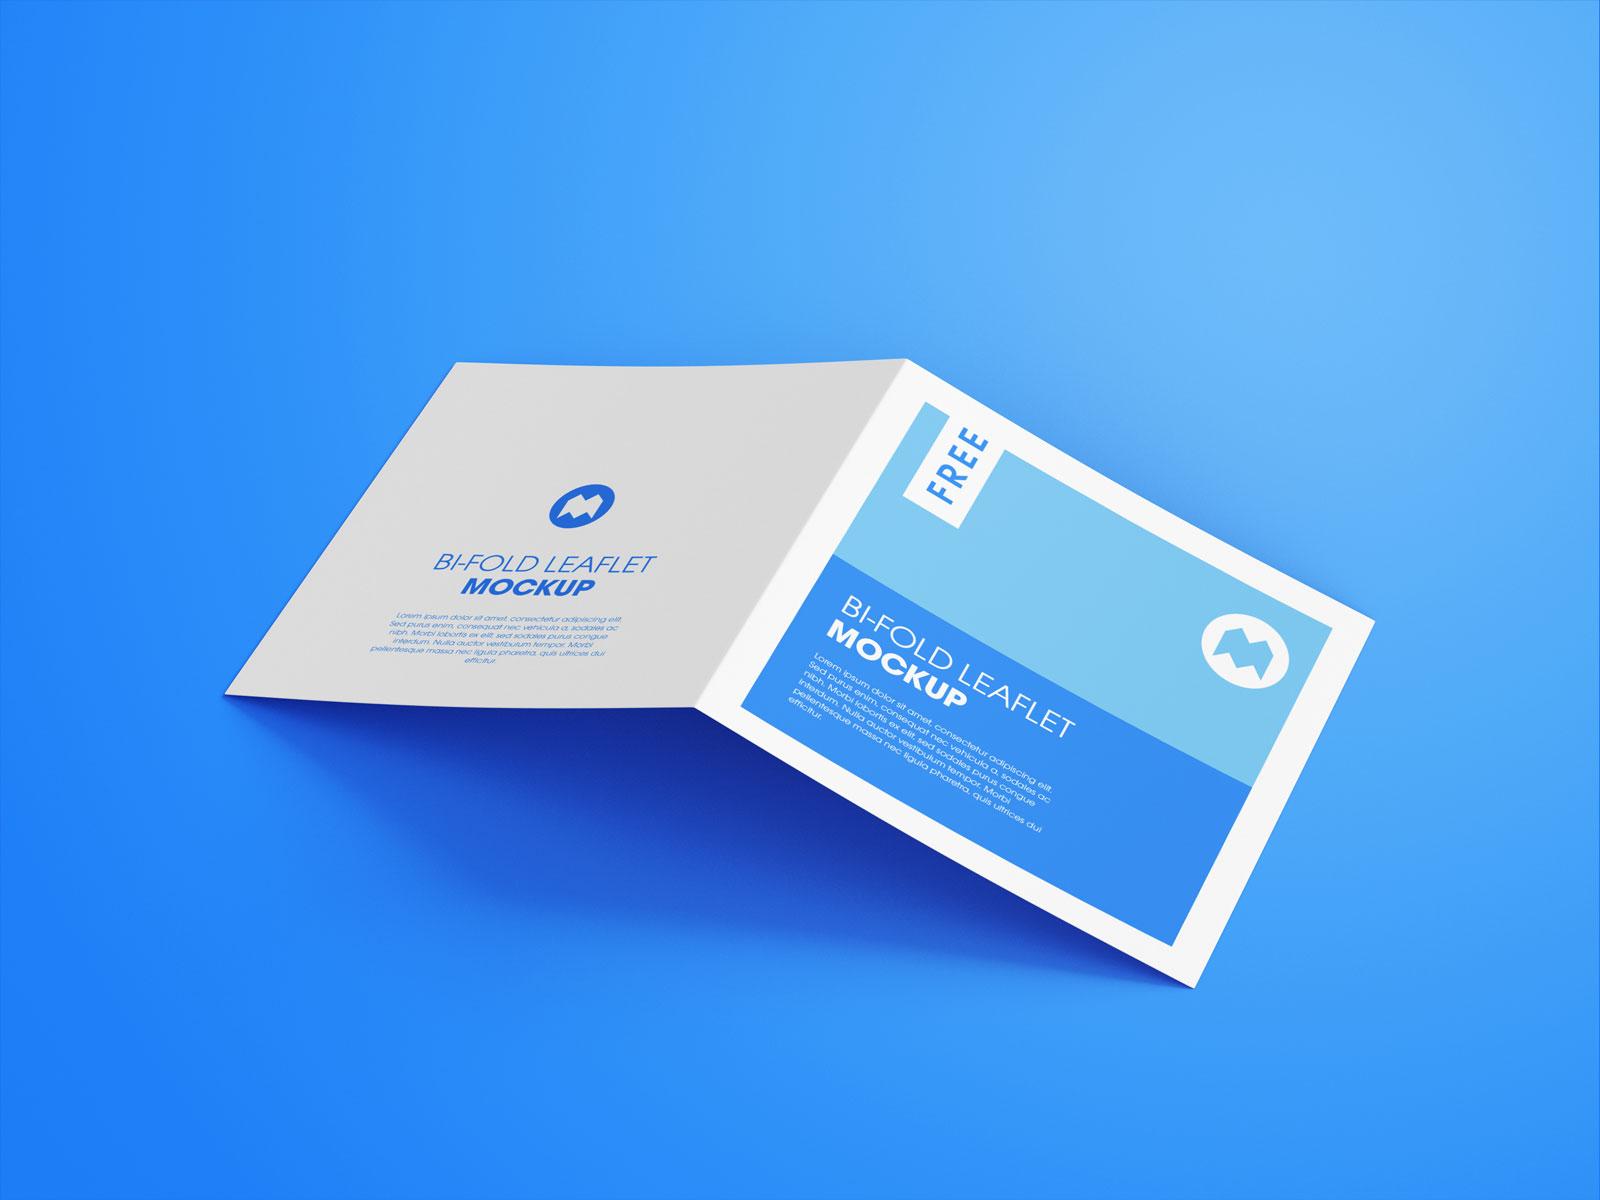 Free Square Bi-Fold Brochure Mockup PSD Set (2)